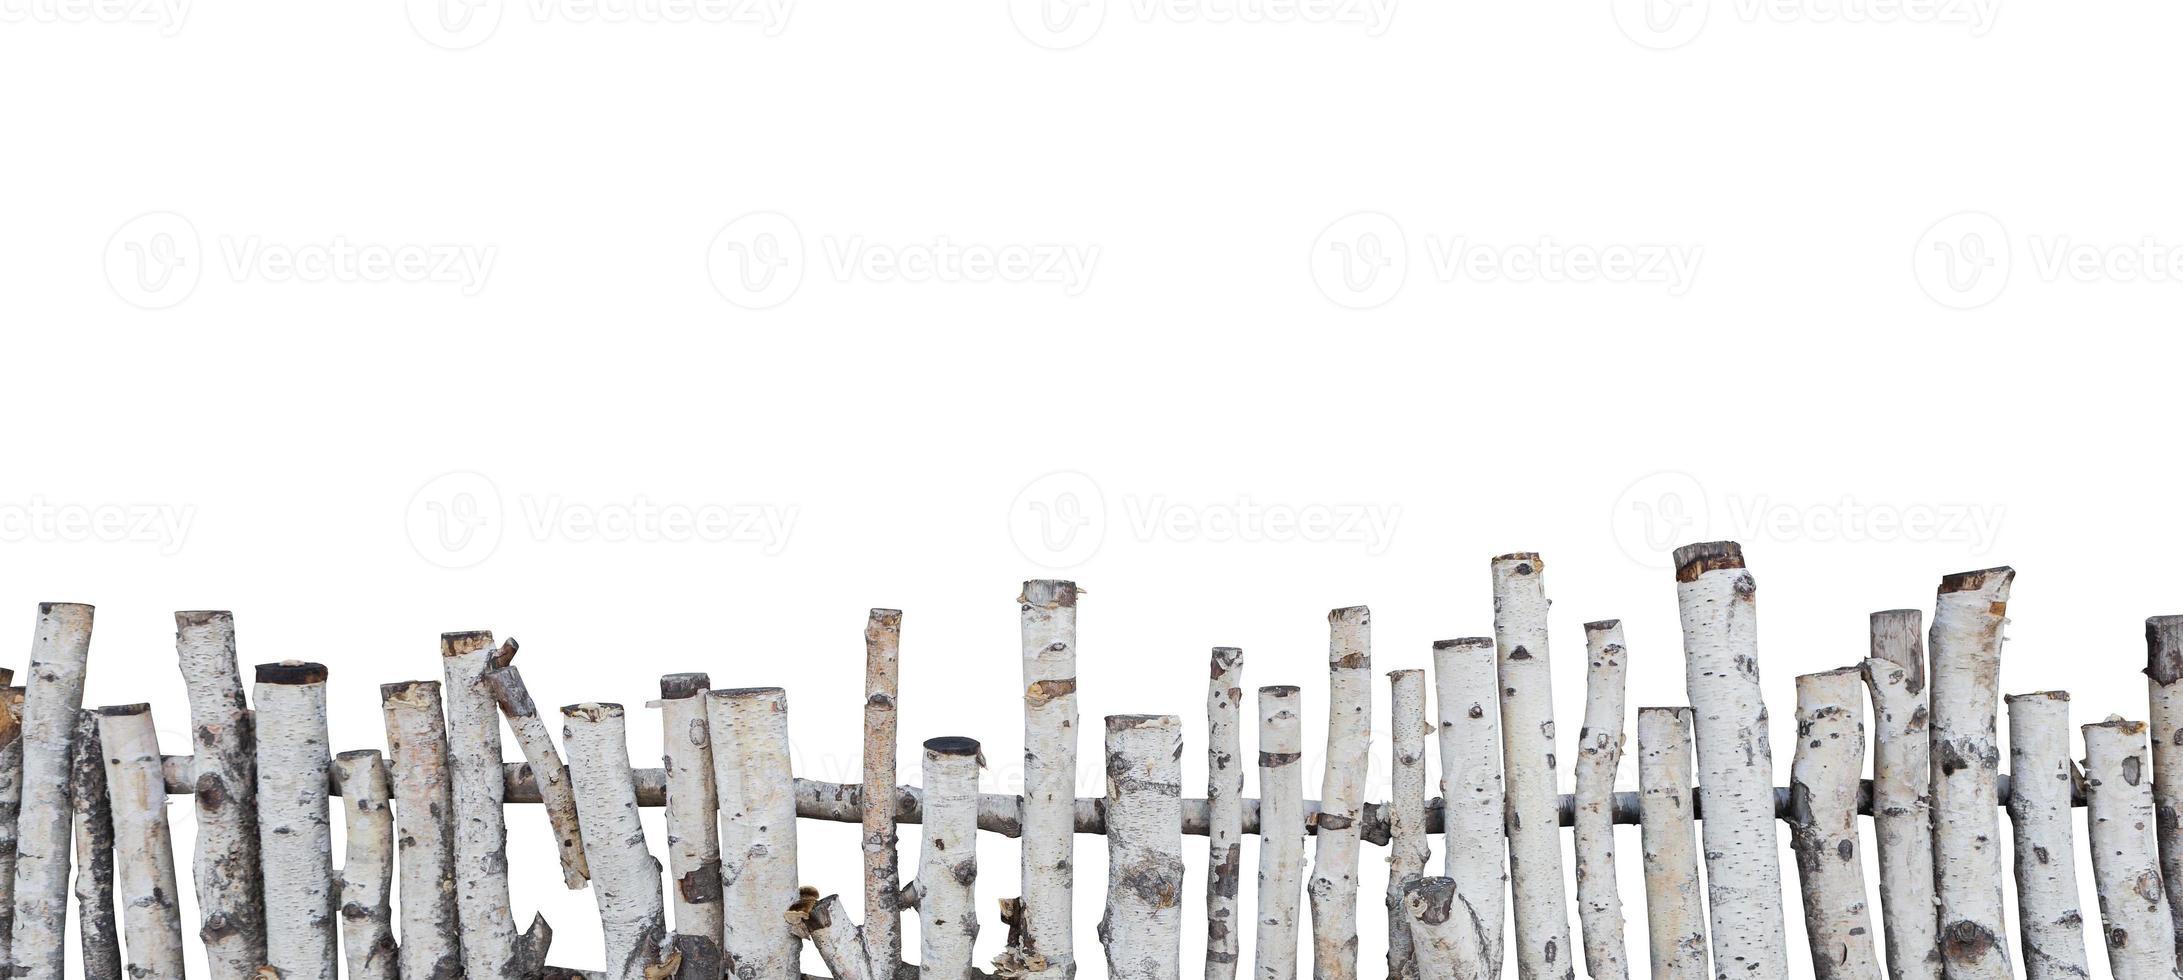 valla de madera vieja foto